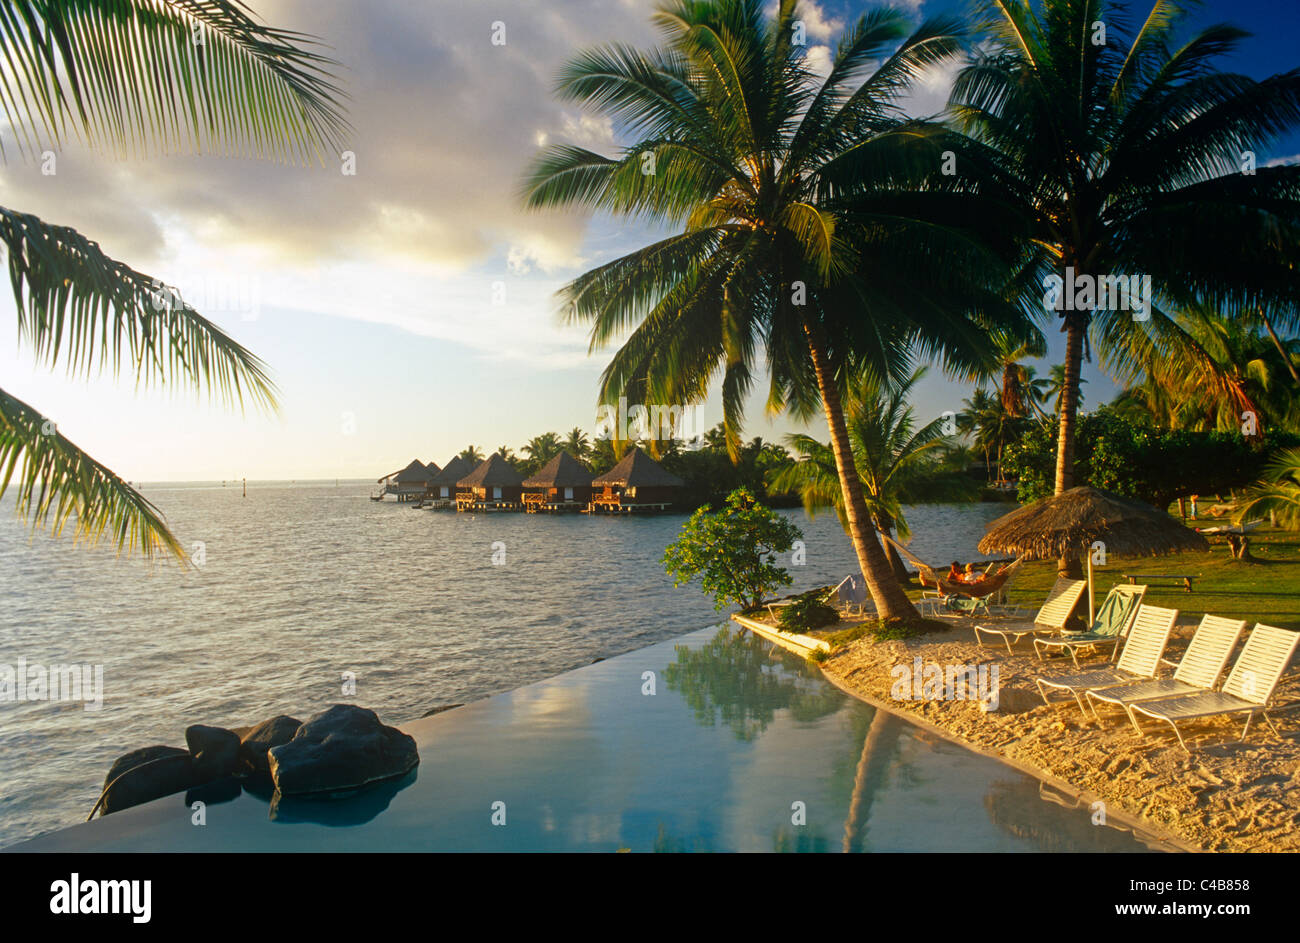 The intercontinental hotel bar stock photos the - Intercontinental park lane swimming pool ...